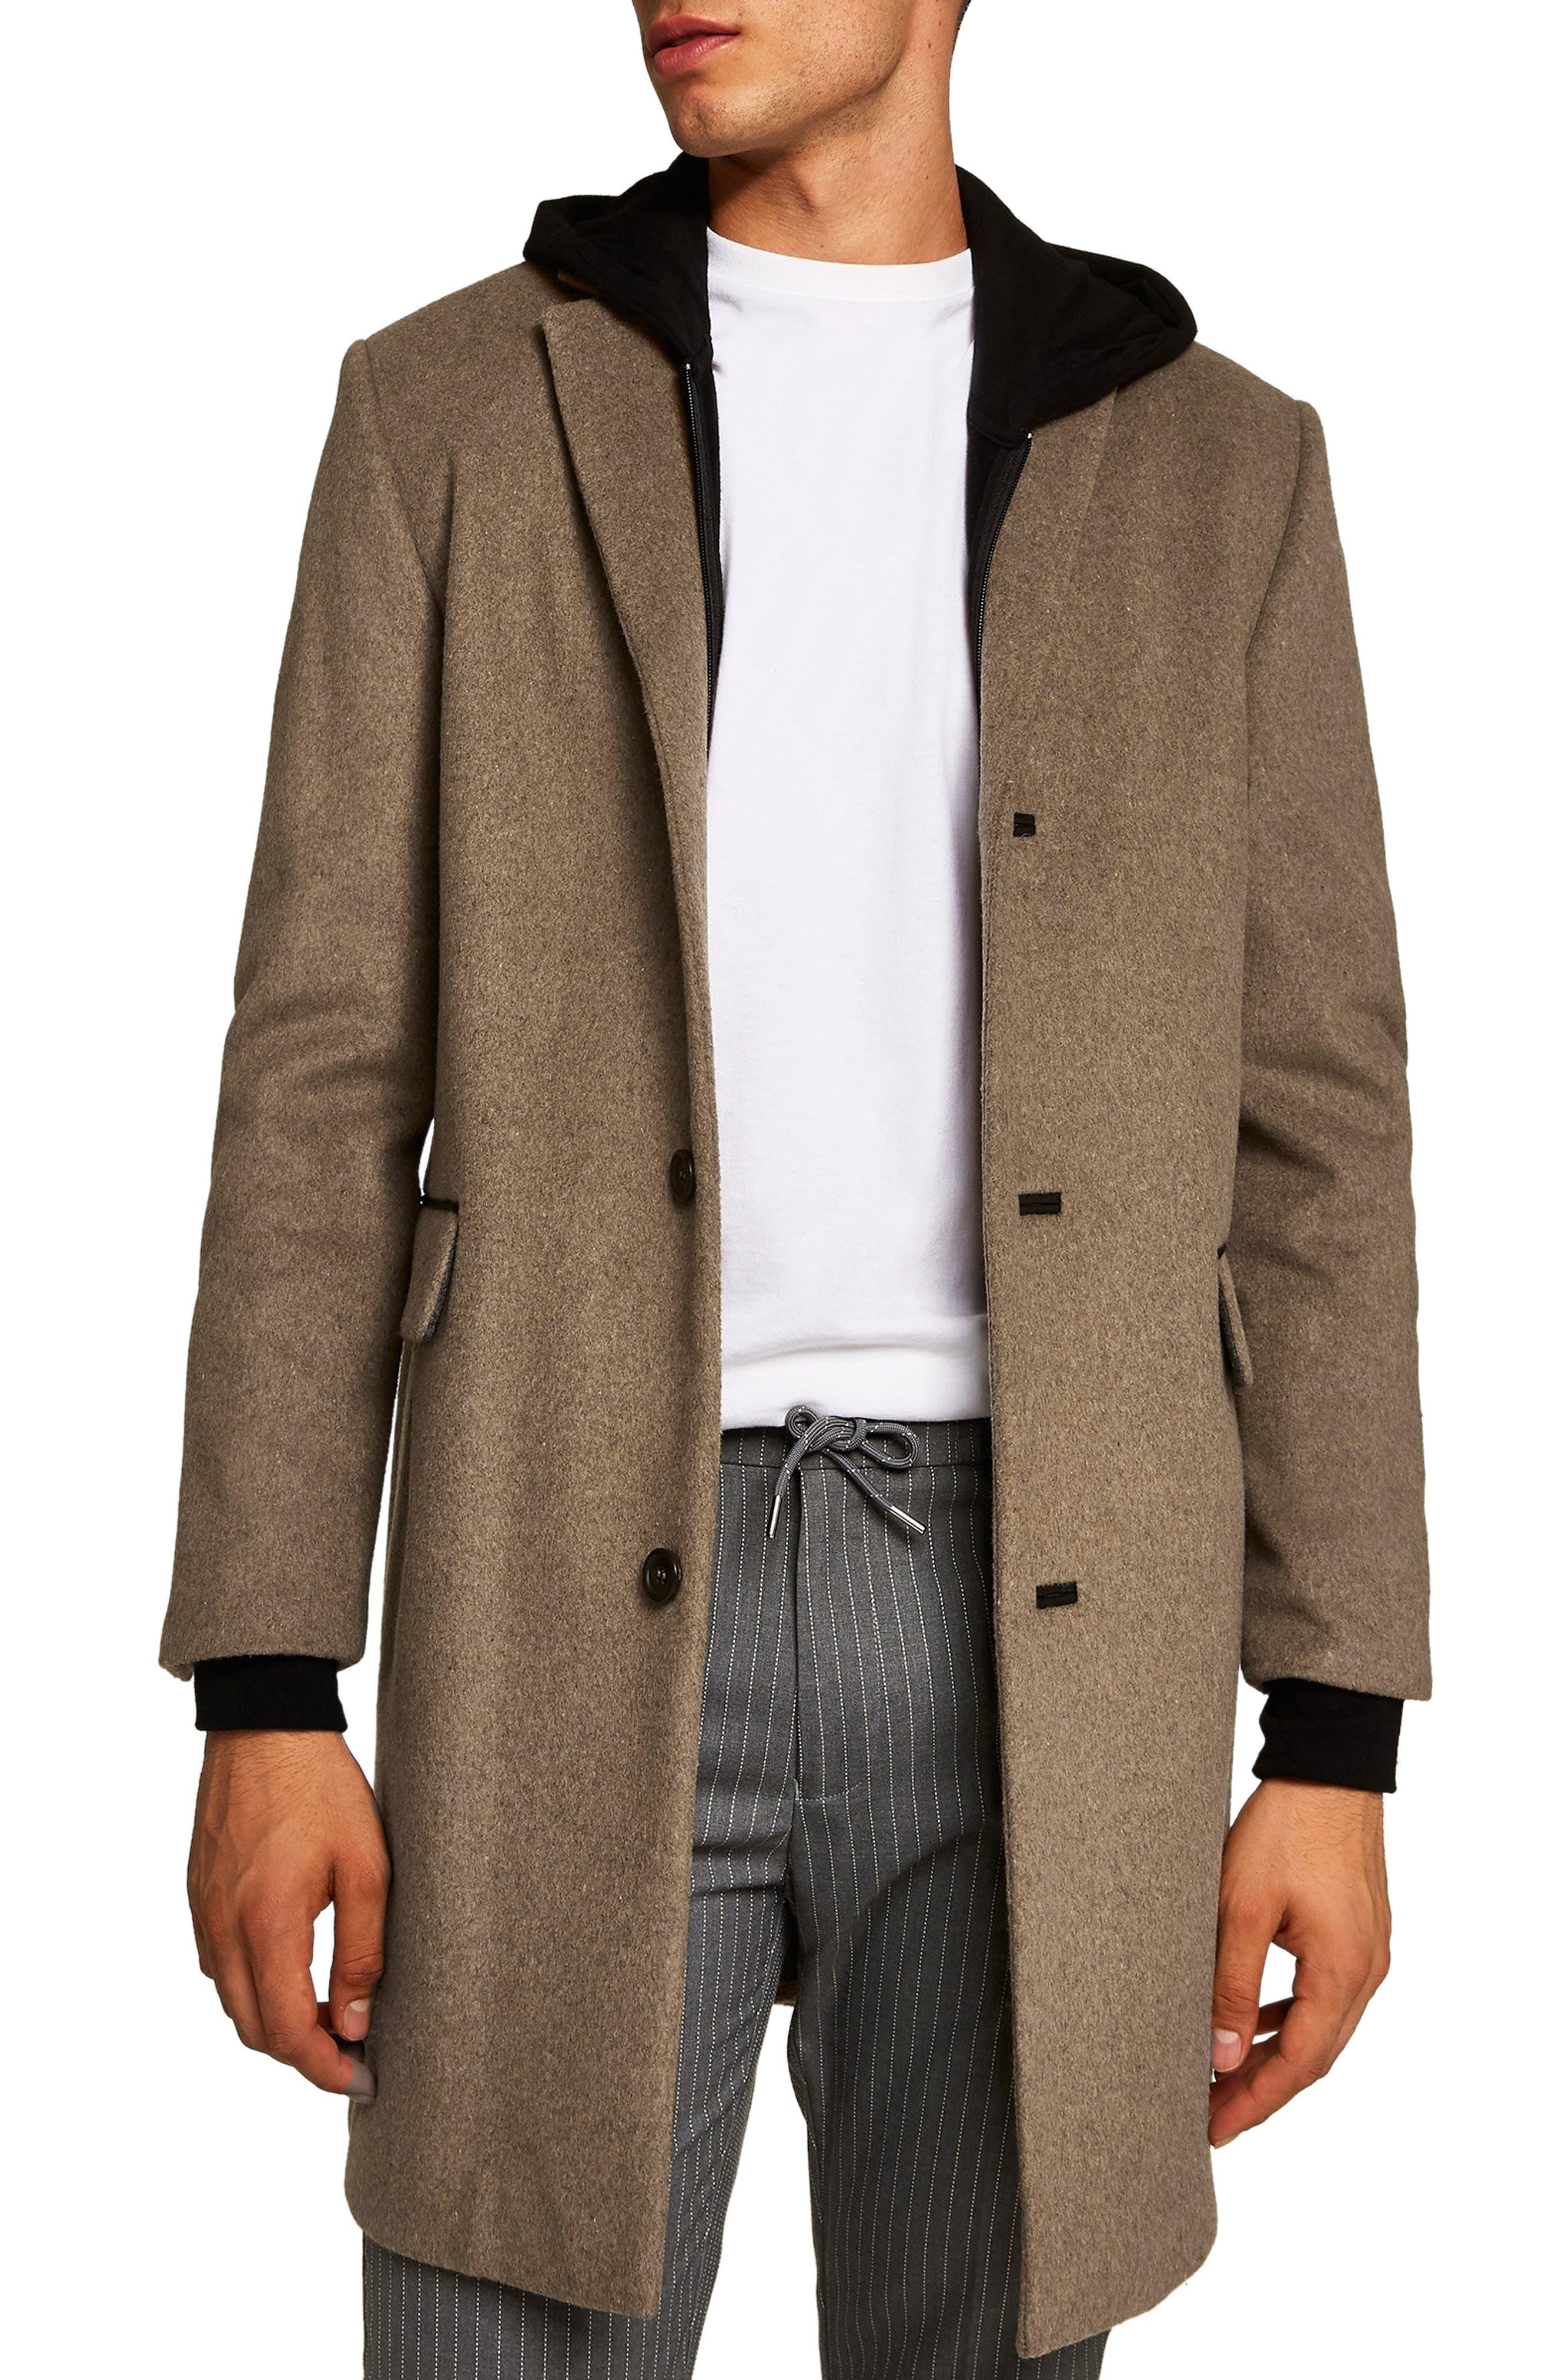 Wool Blend Overcoat,                             Main thumbnail 1, color,                             LIGHT BROWN